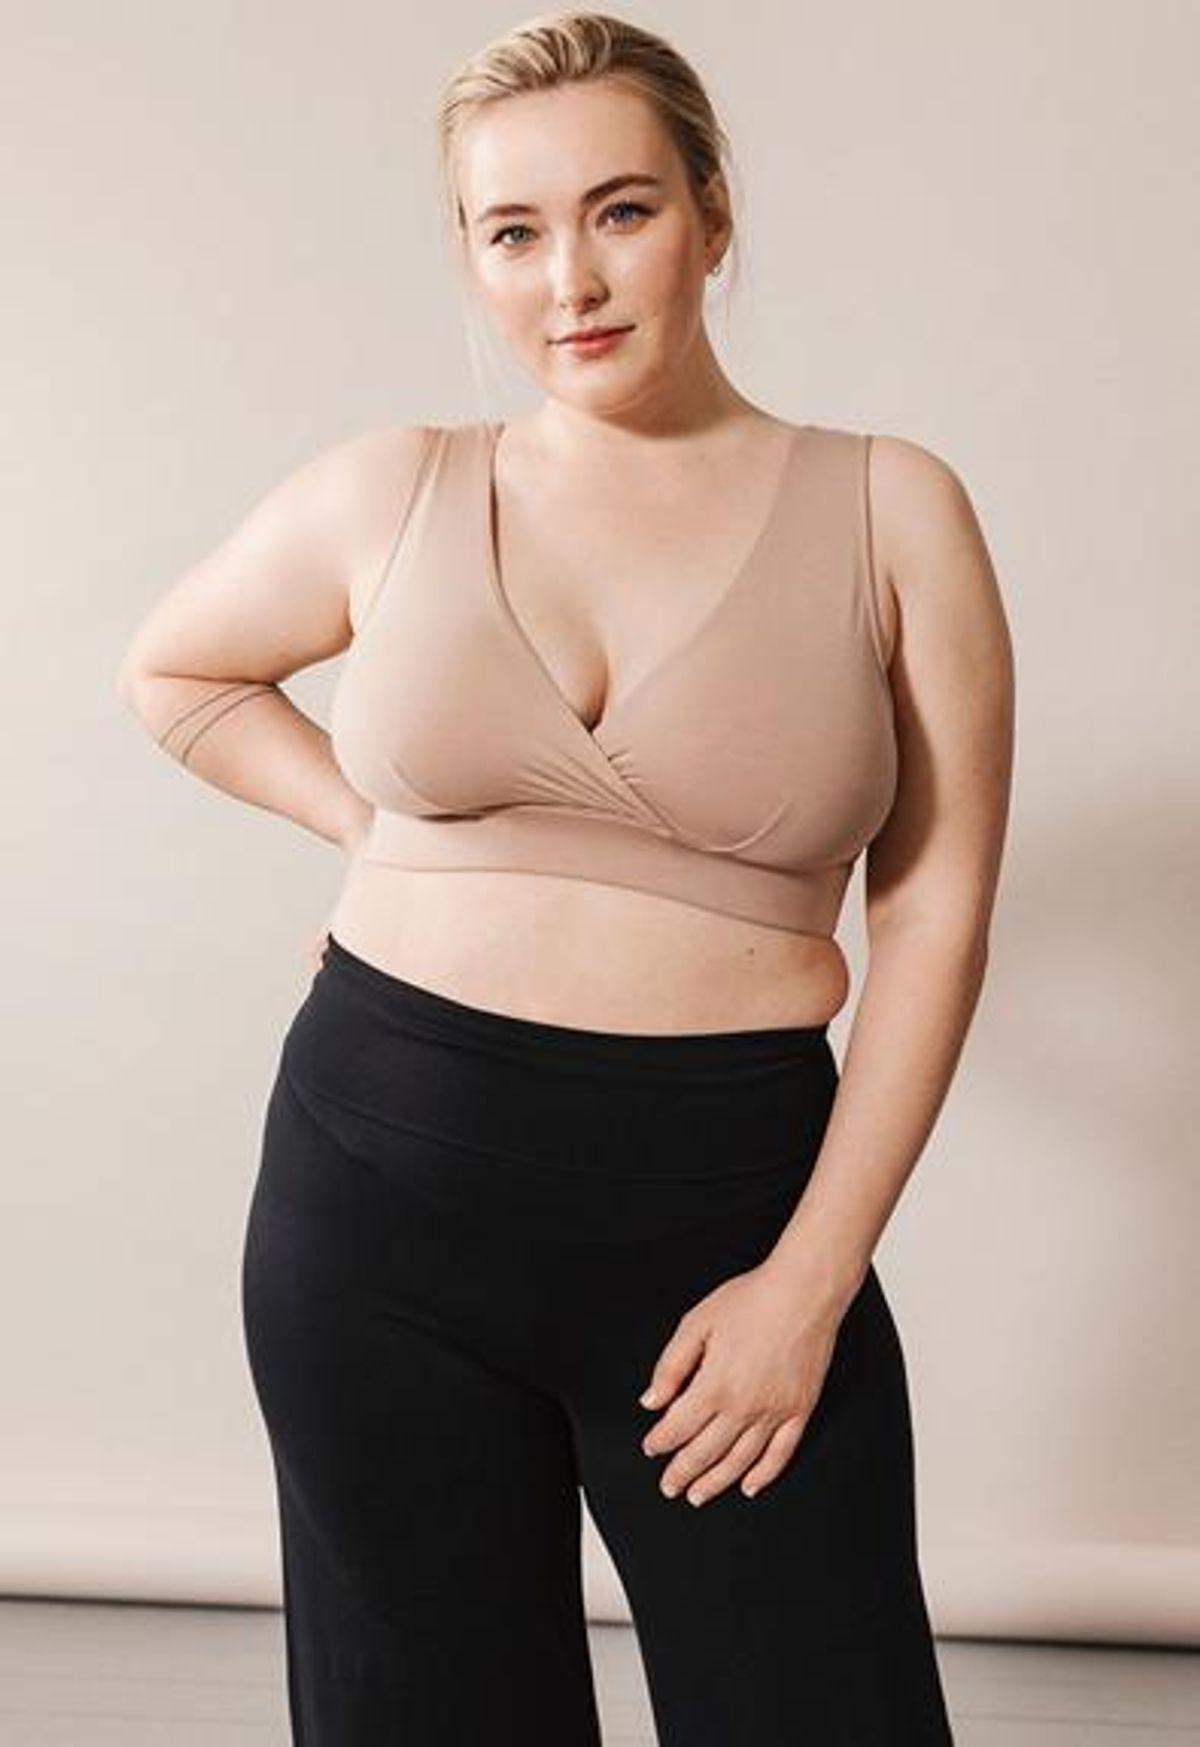 boob 247 full cup bra